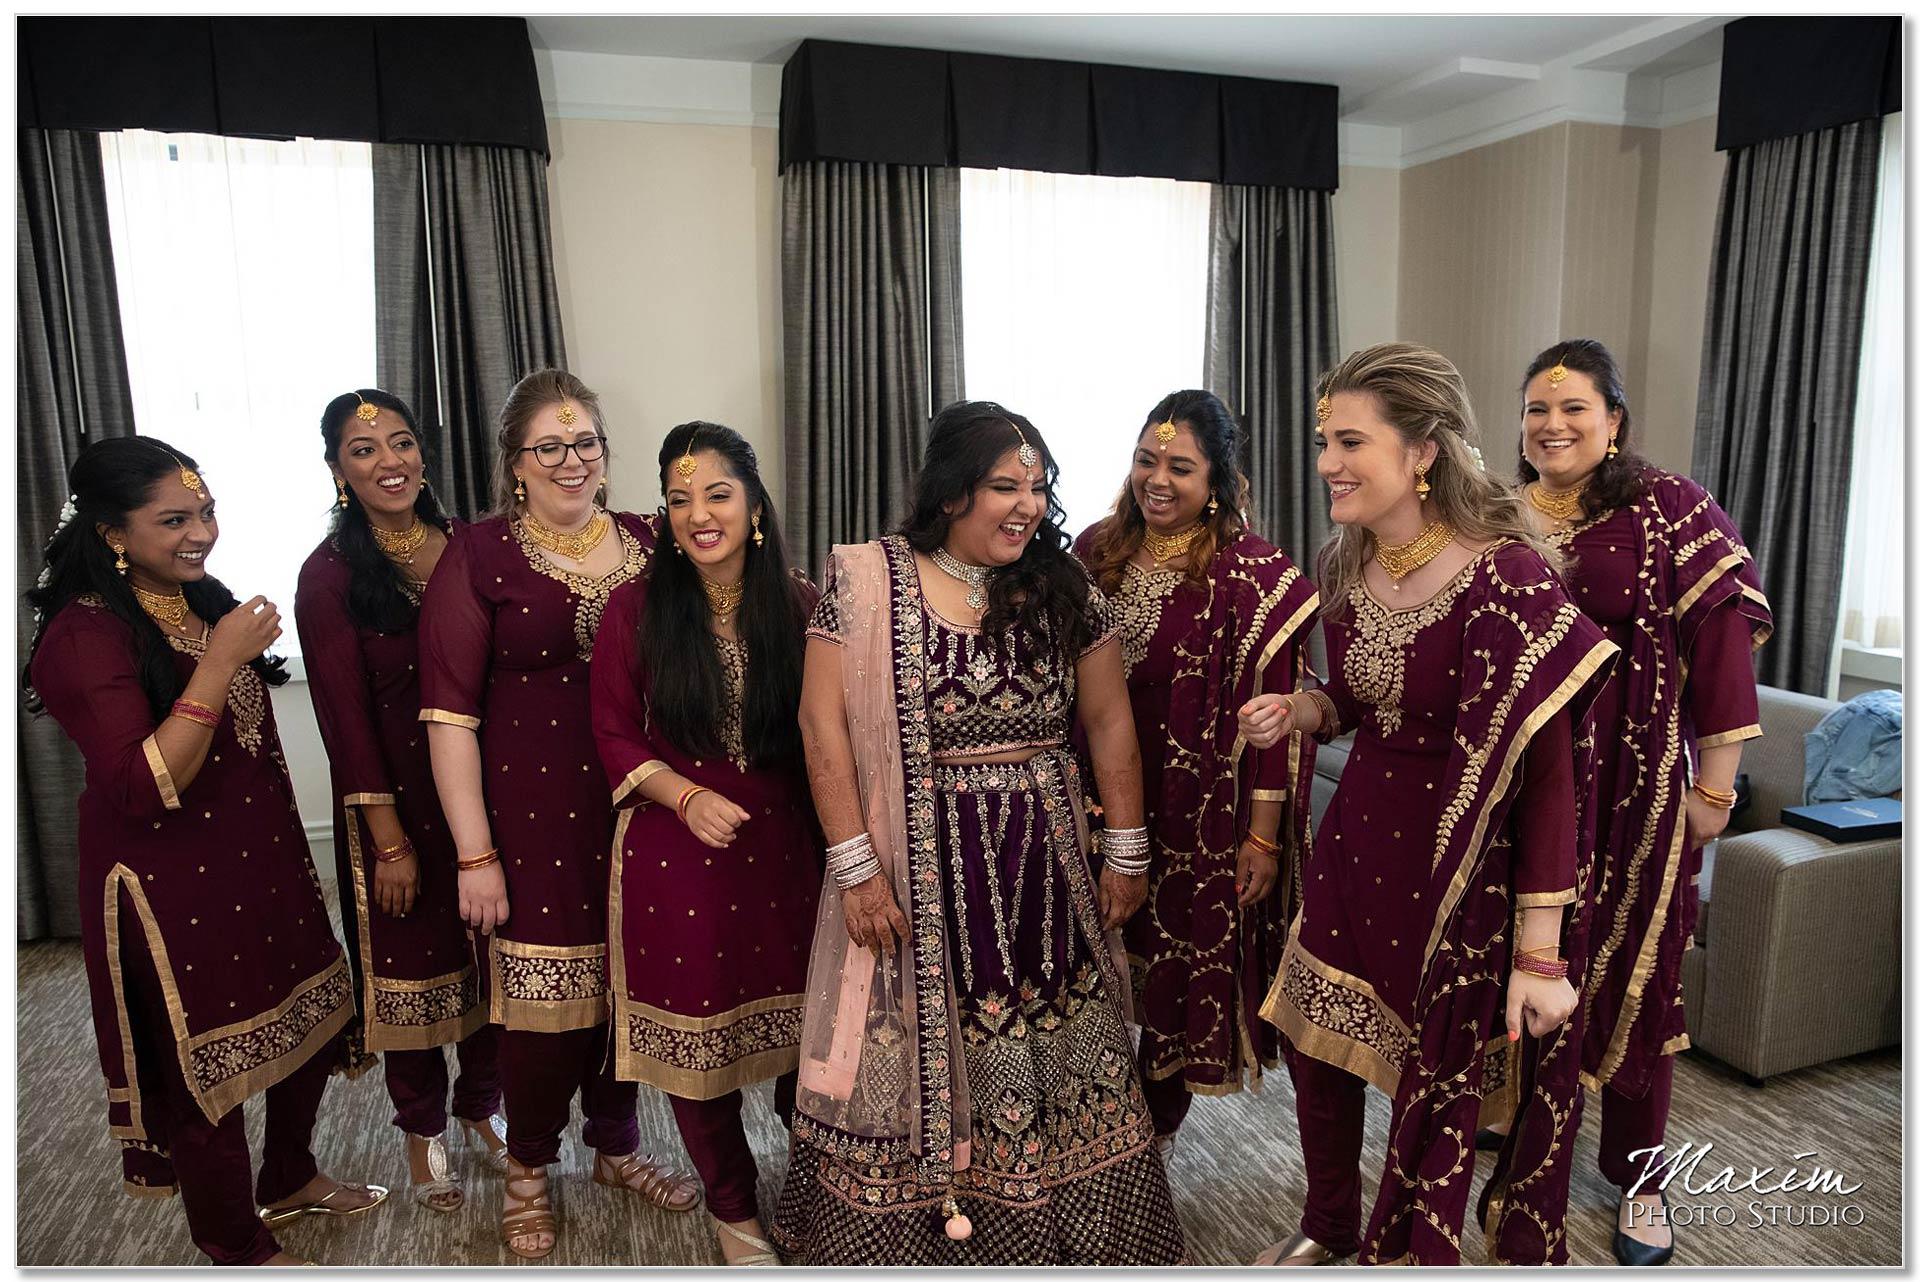 Hilton Netherland Plaza Indian wedding bridesmaids having fun